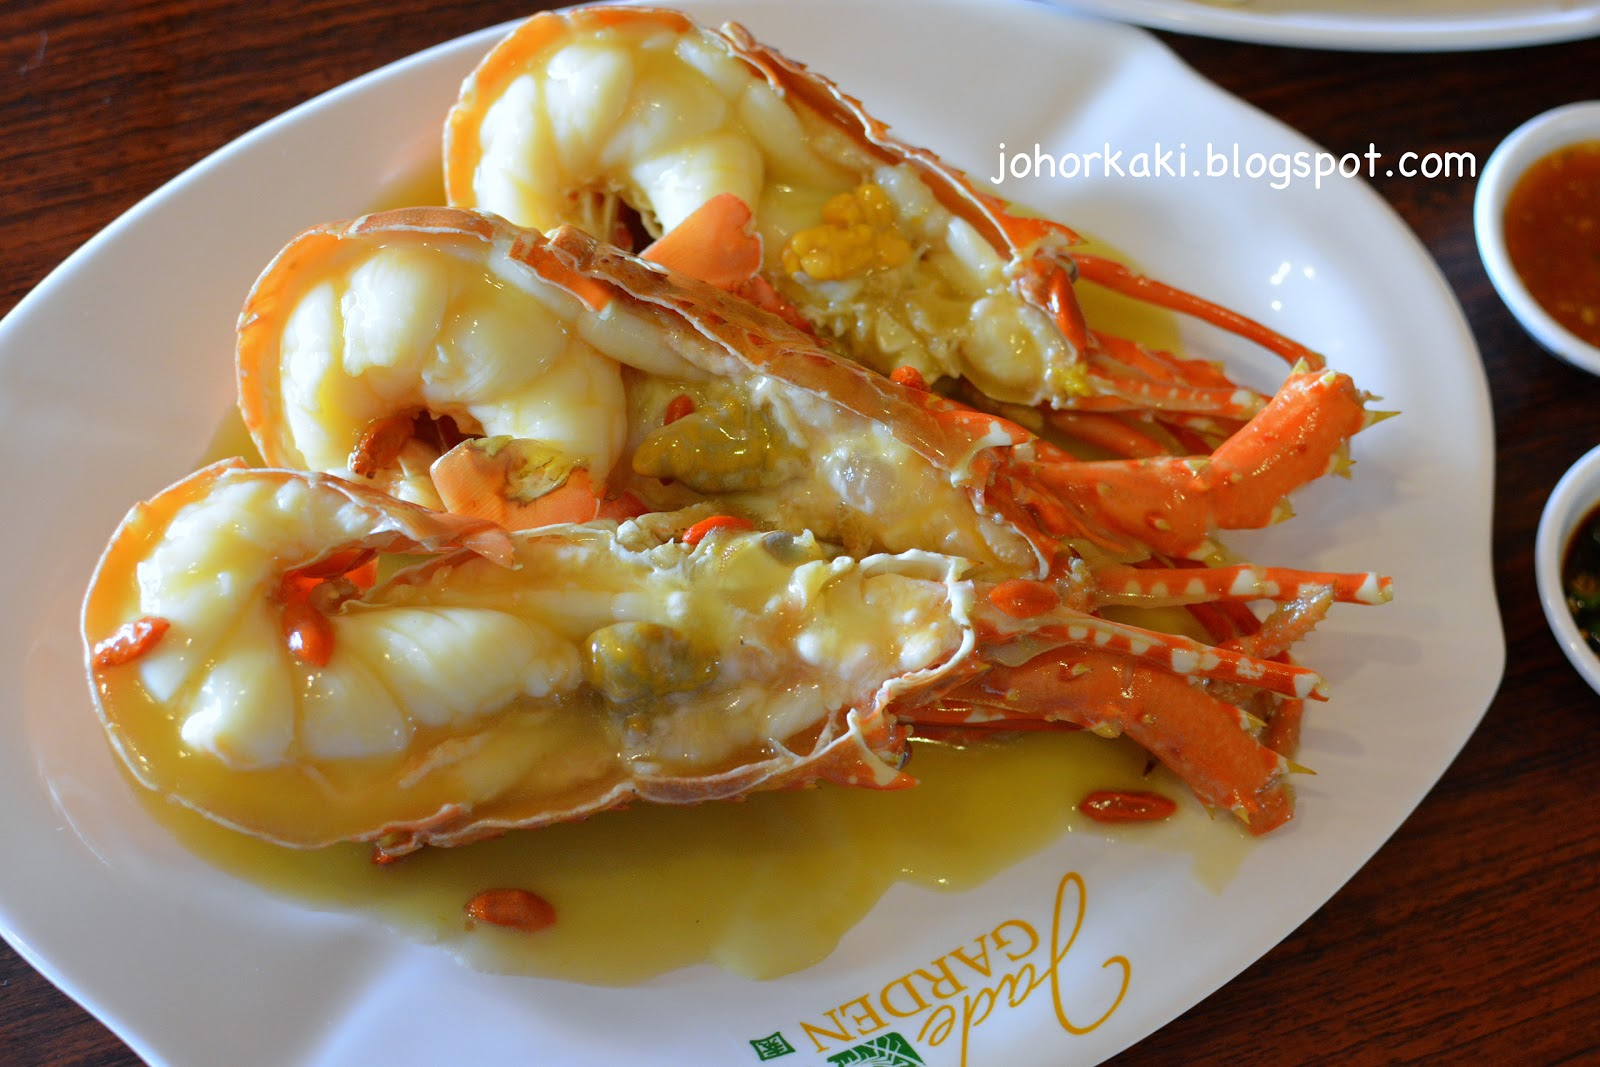 Jade Garden Seafood Restaurant at Sungai Rengit Lobster JK1273 ...